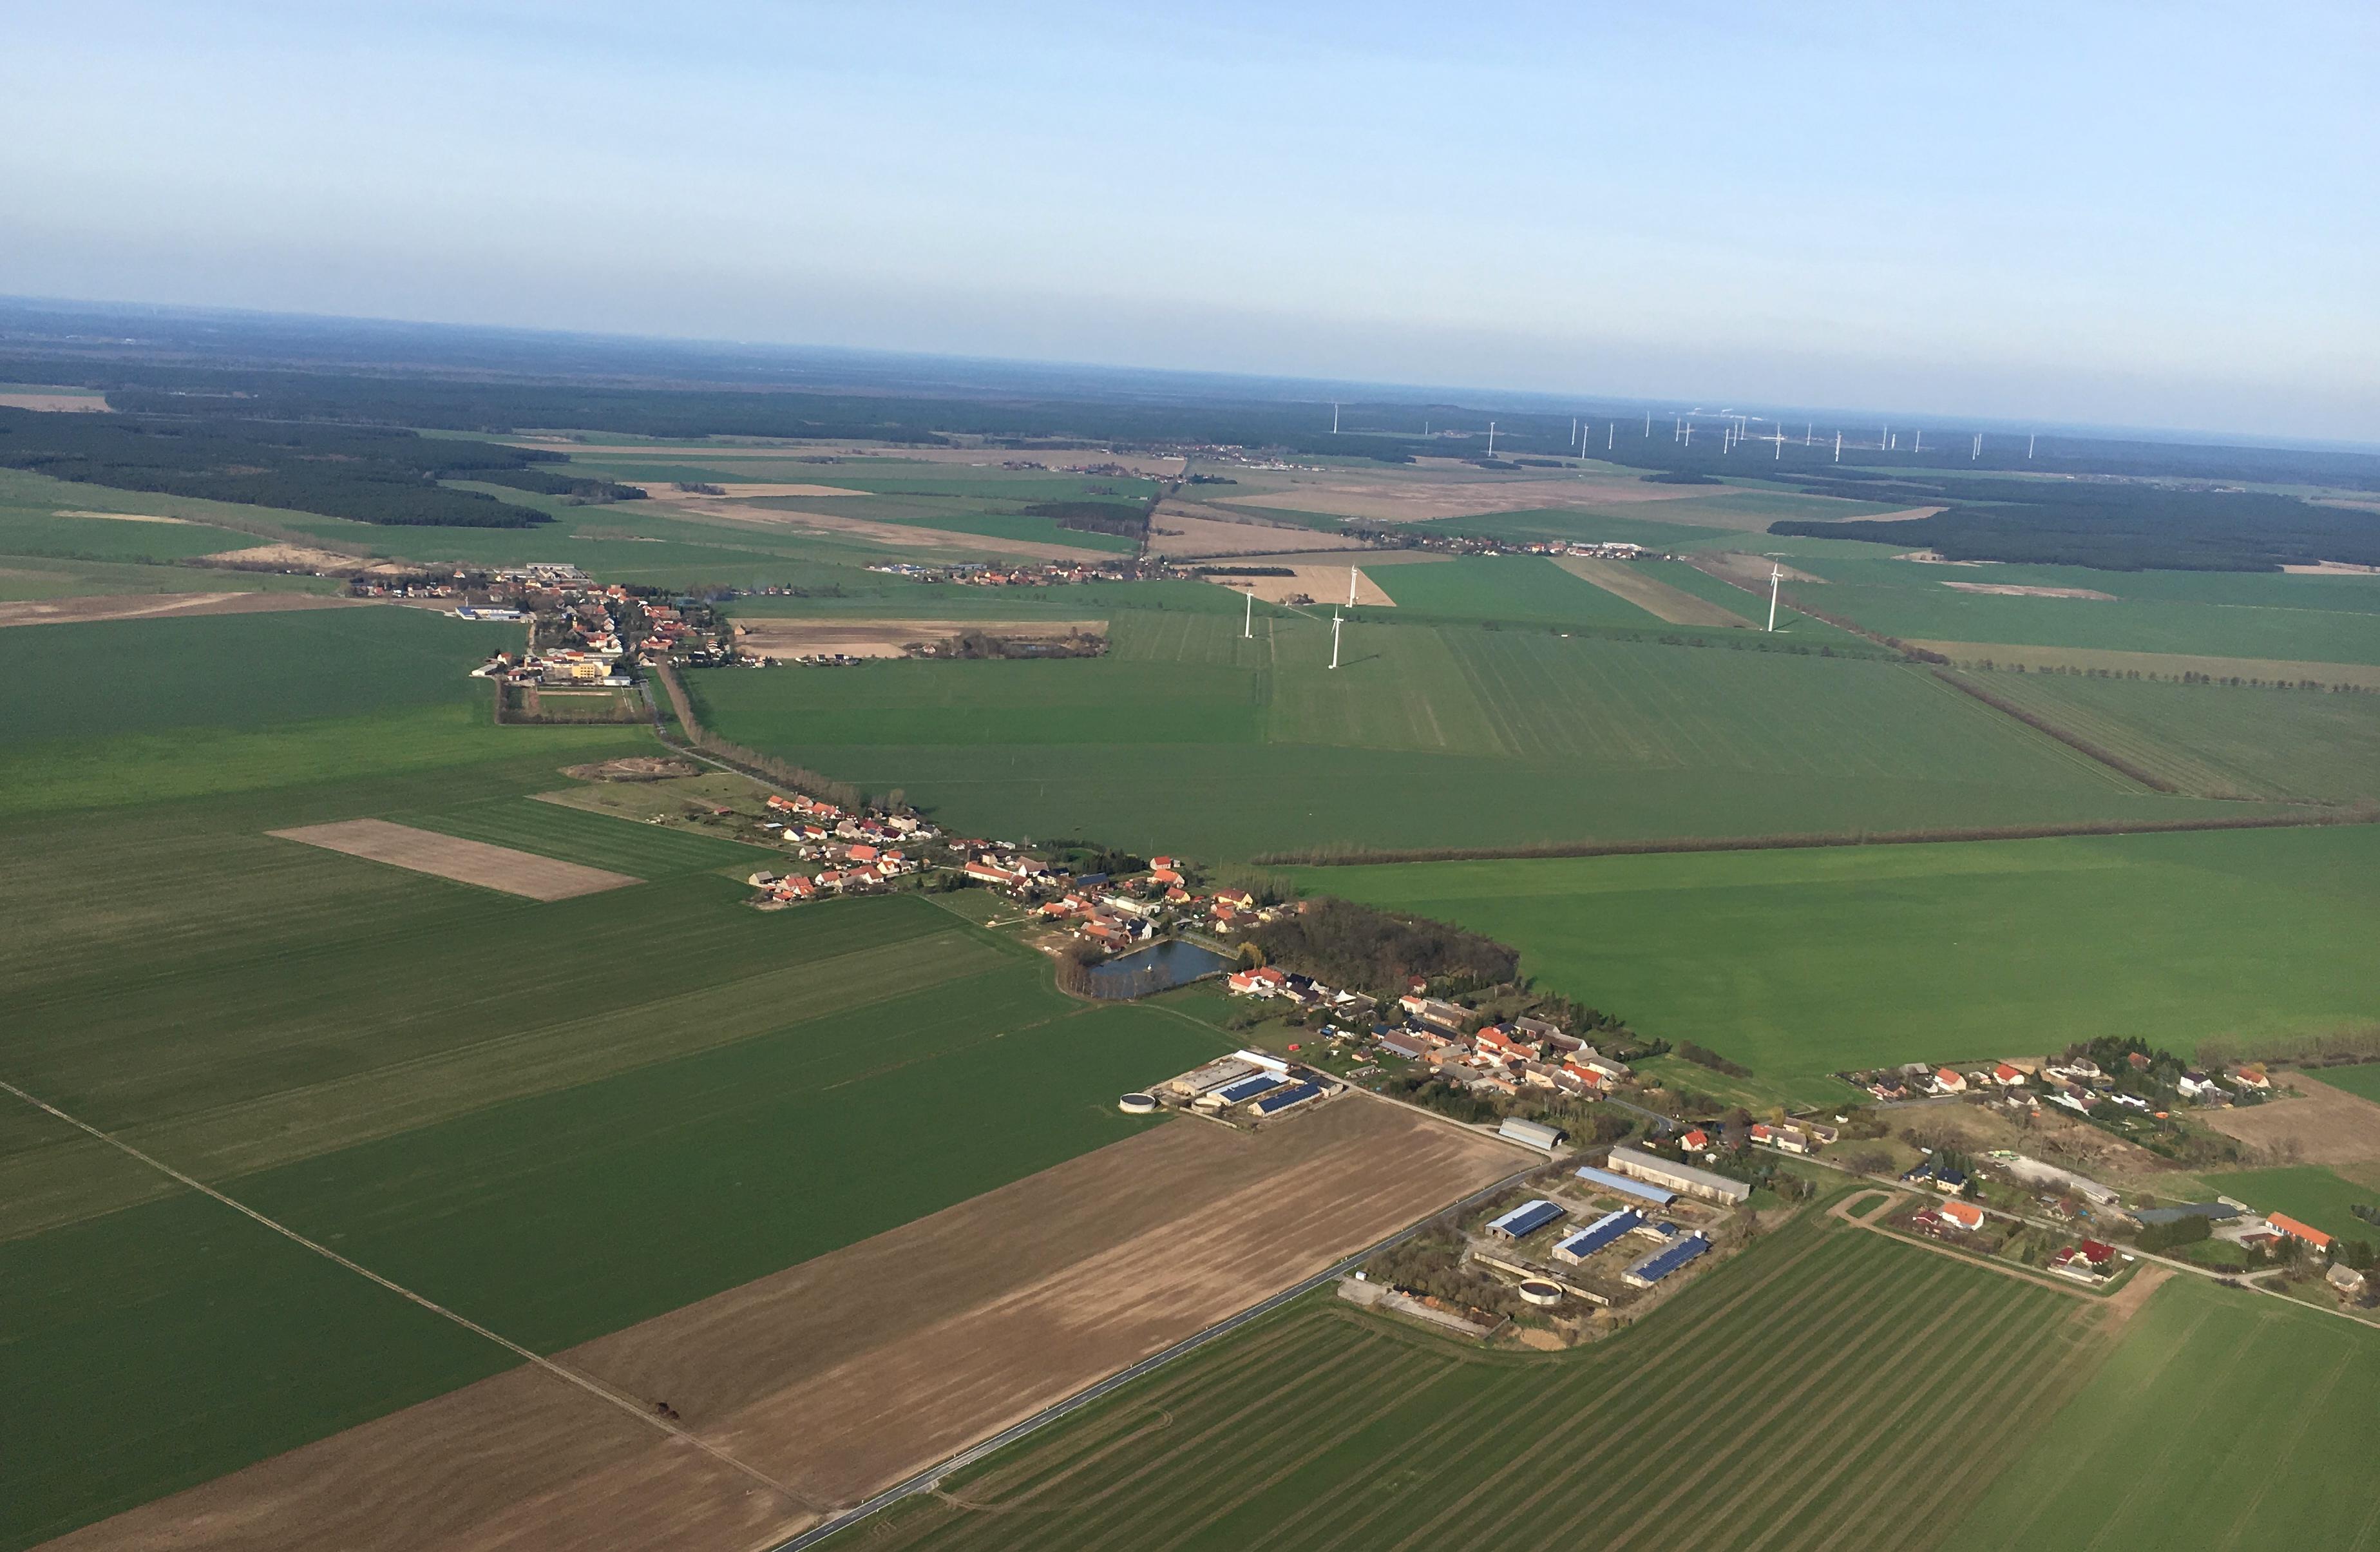 Ural Airlines Notlandung – U6178 landet in Maisfeld